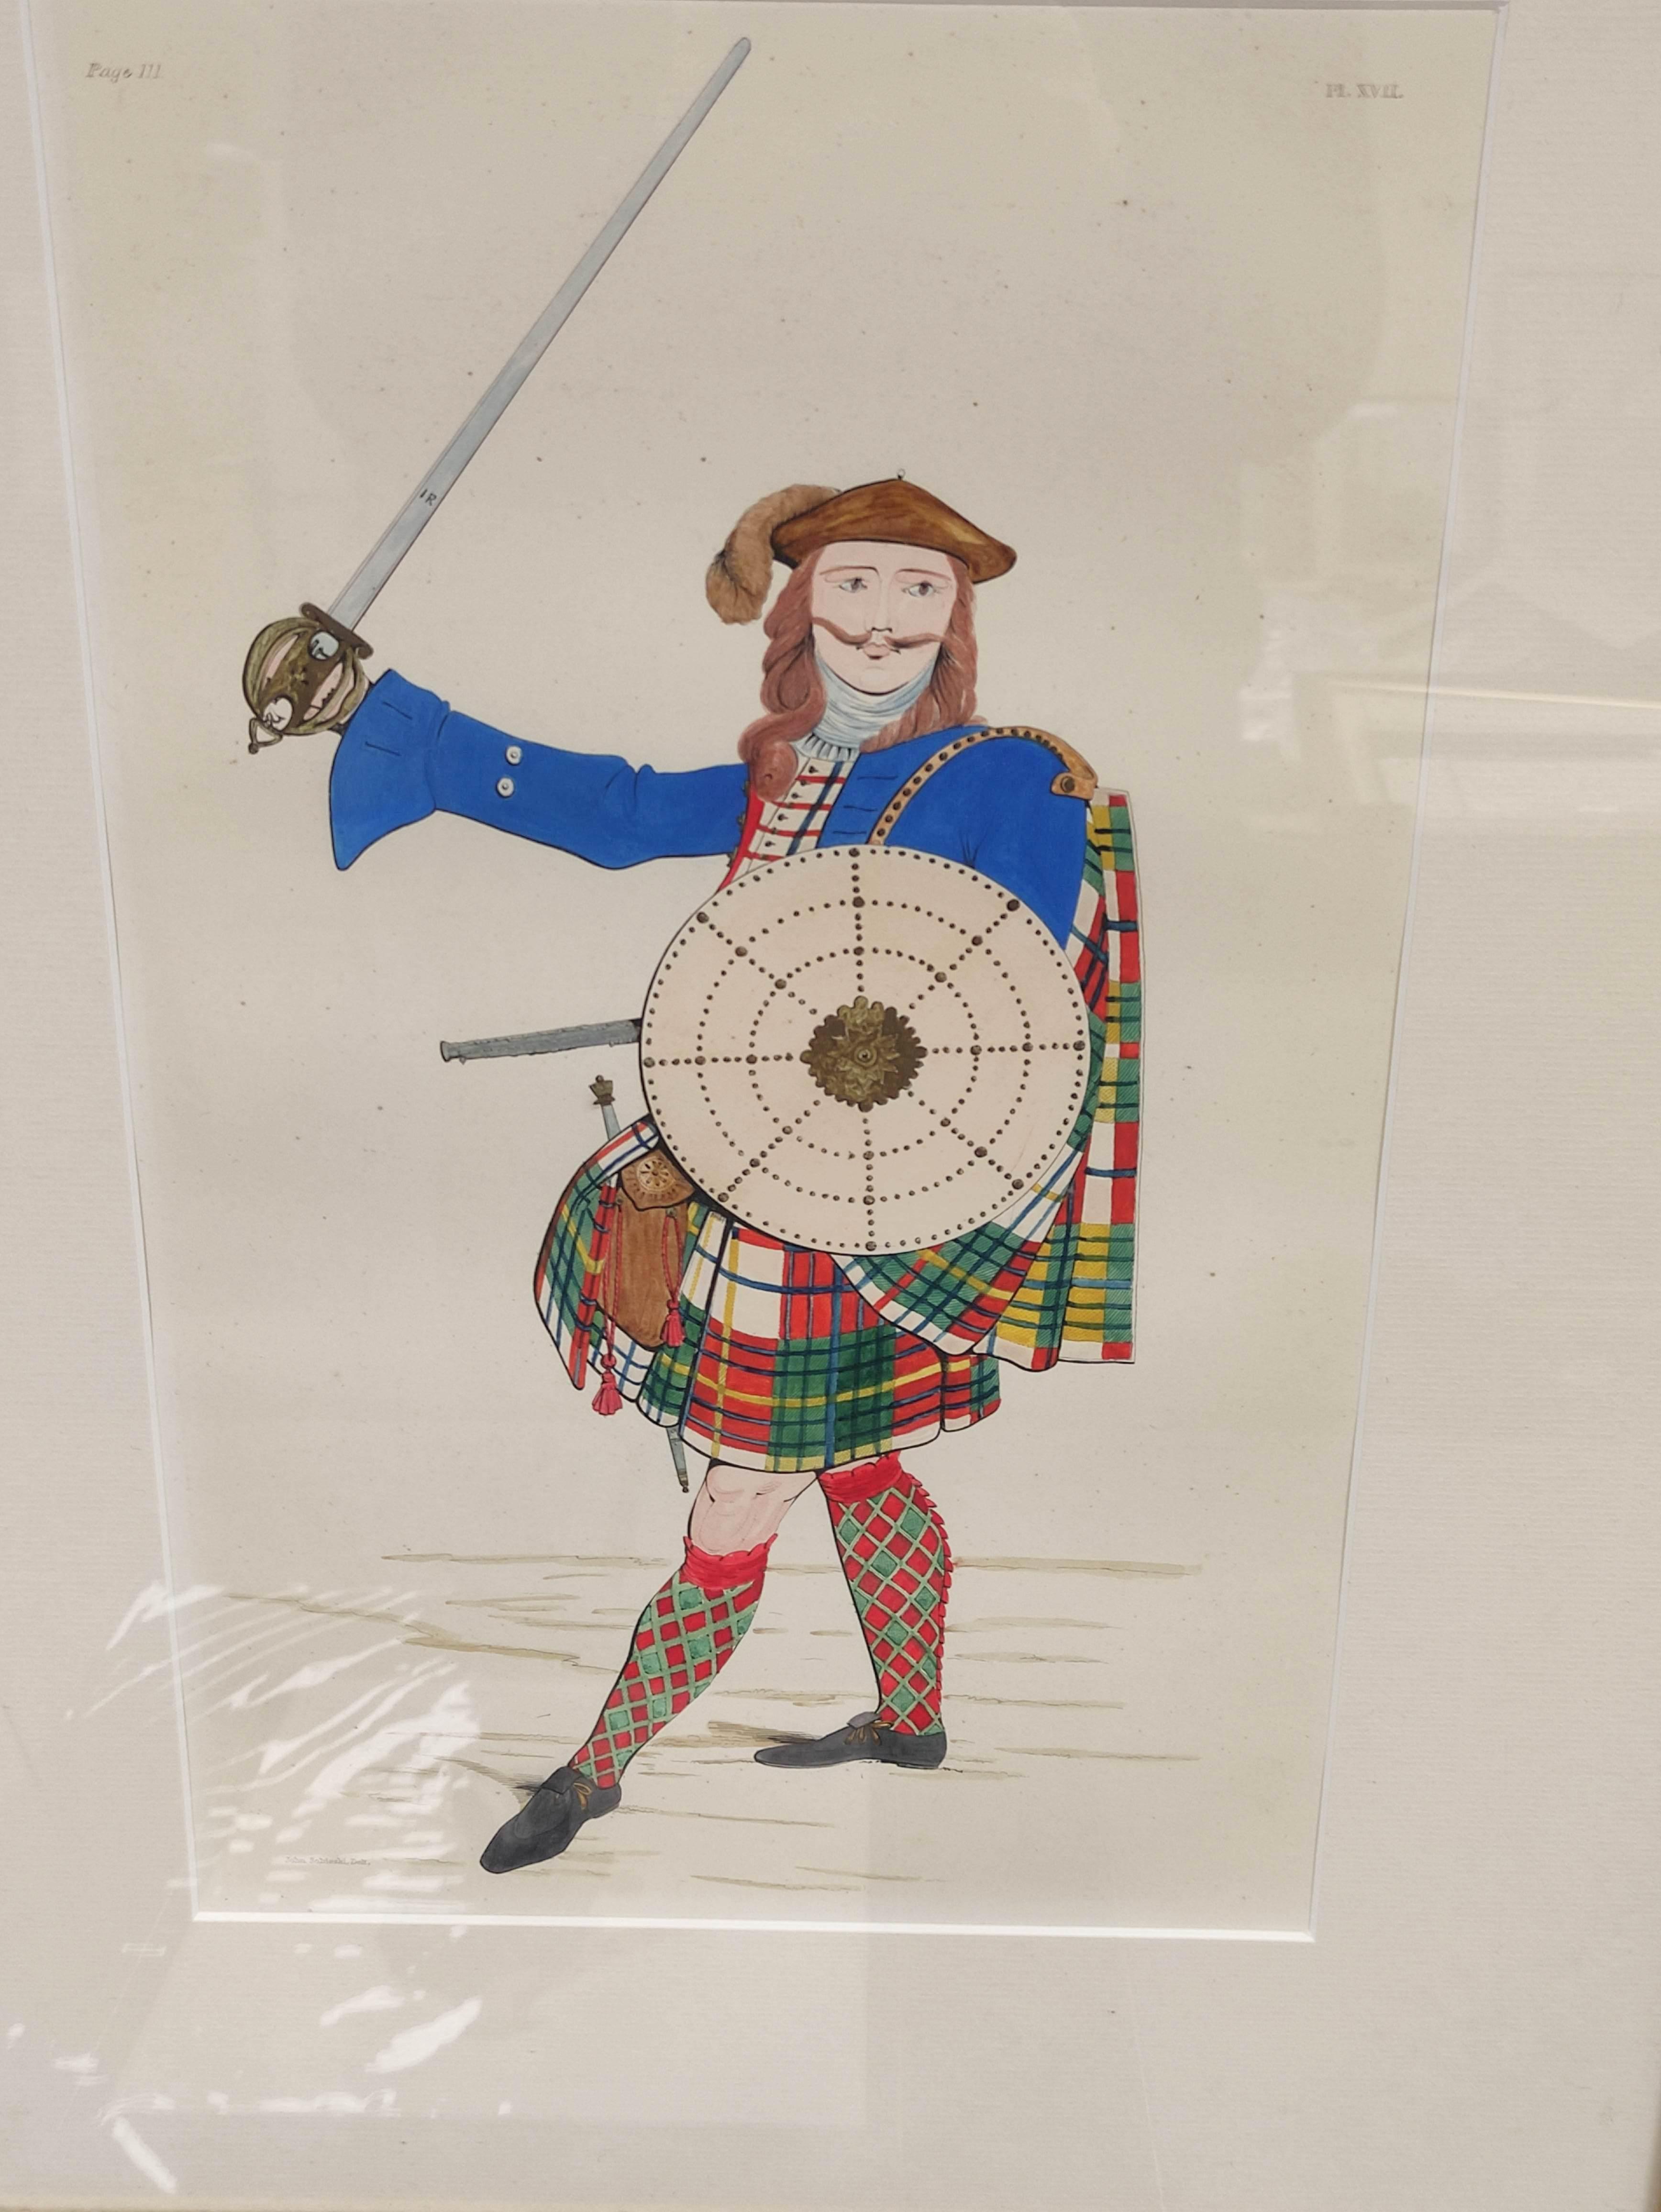 Highland Costume.4 hand coloured engraved plates, 2 framed. - Image 3 of 6